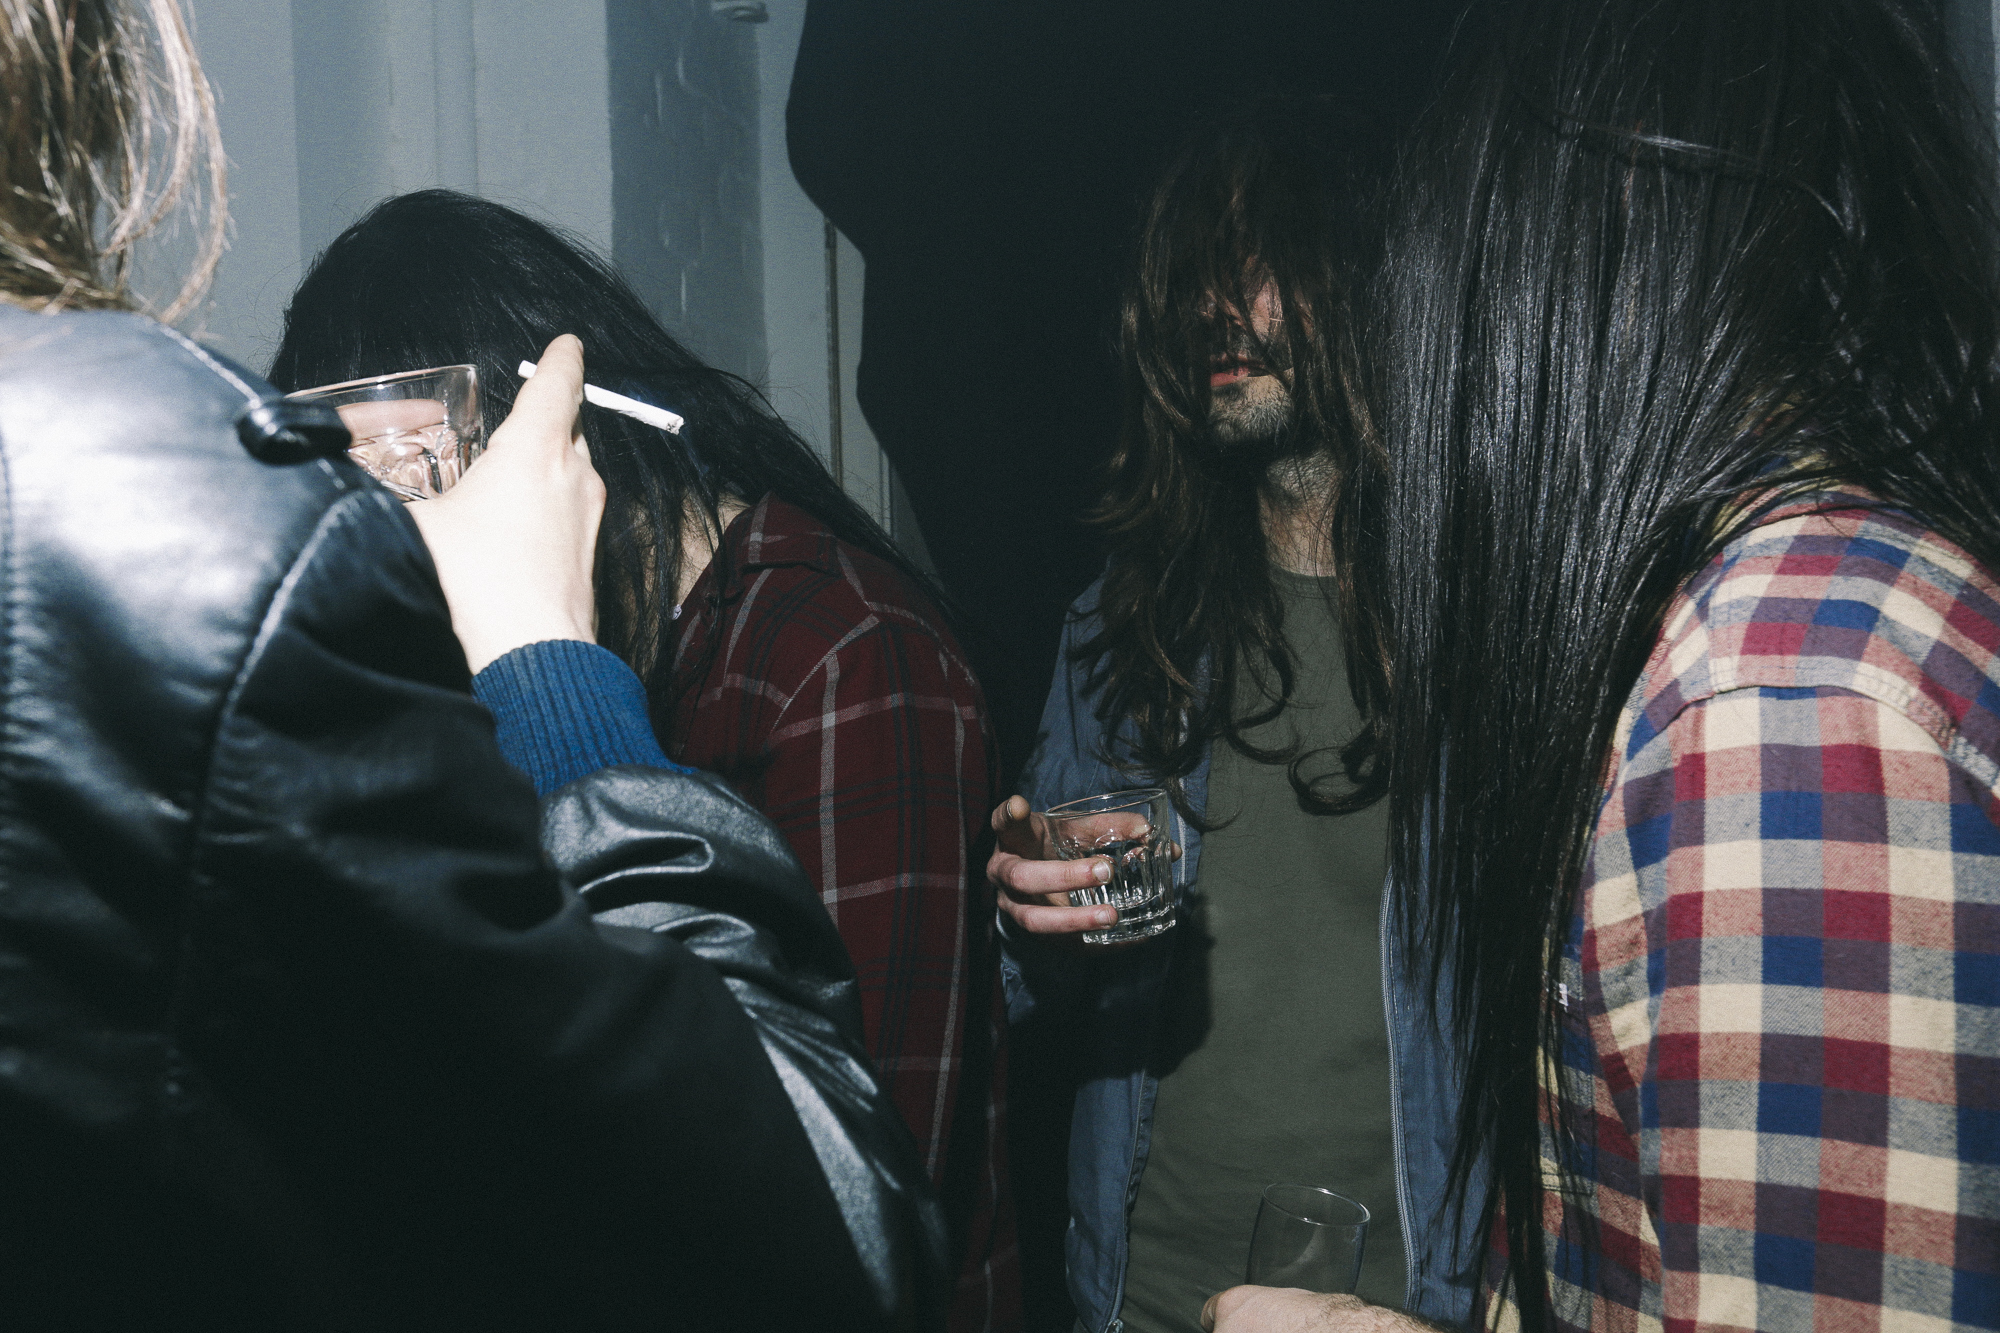 THE SCHMUTZ Photo | Brand'o